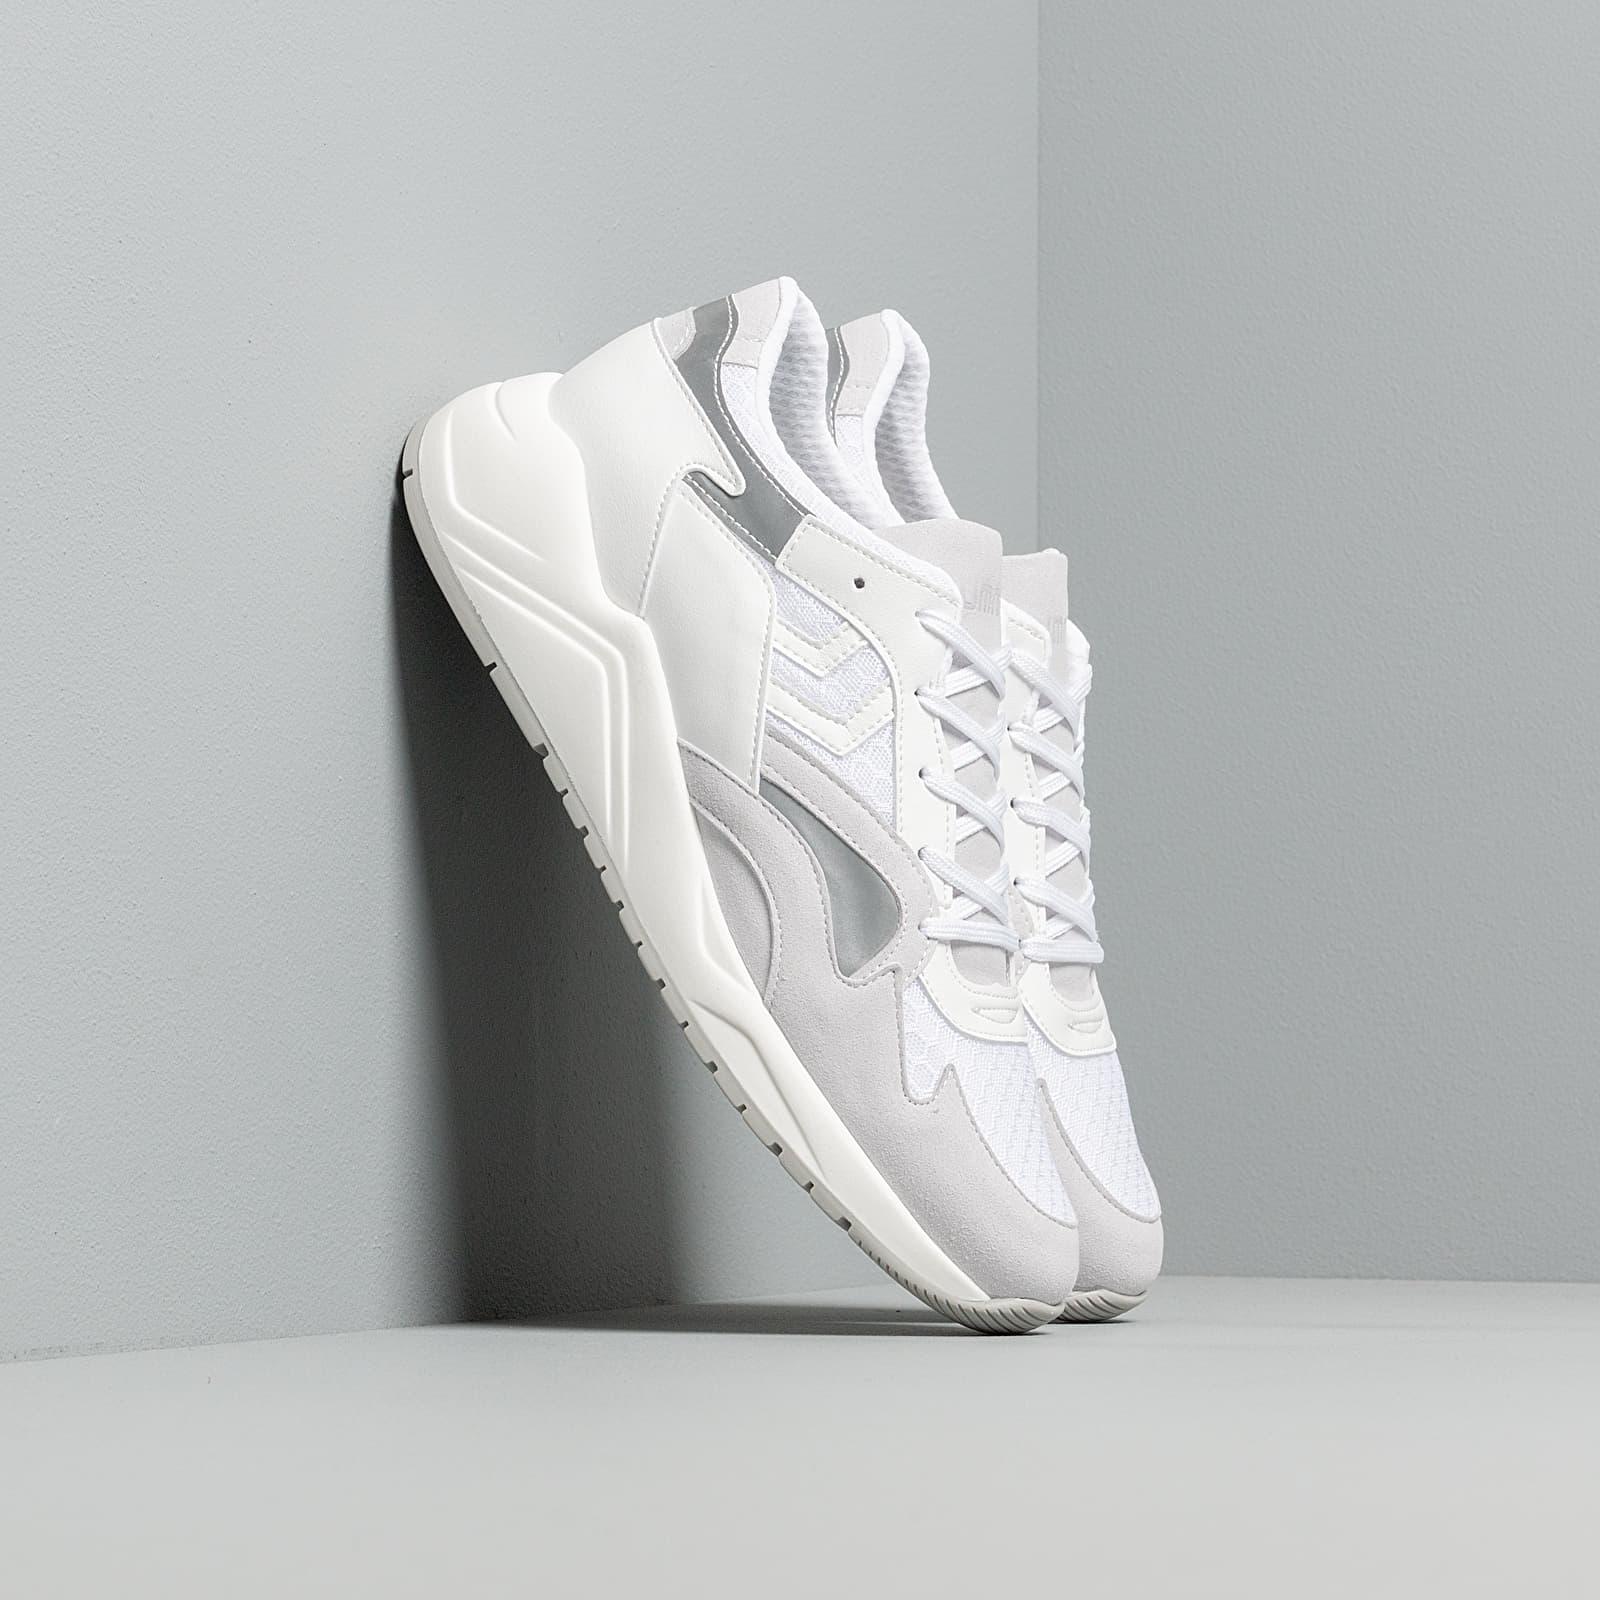 Chaussures et baskets homme Hummel Edmonton Premium White